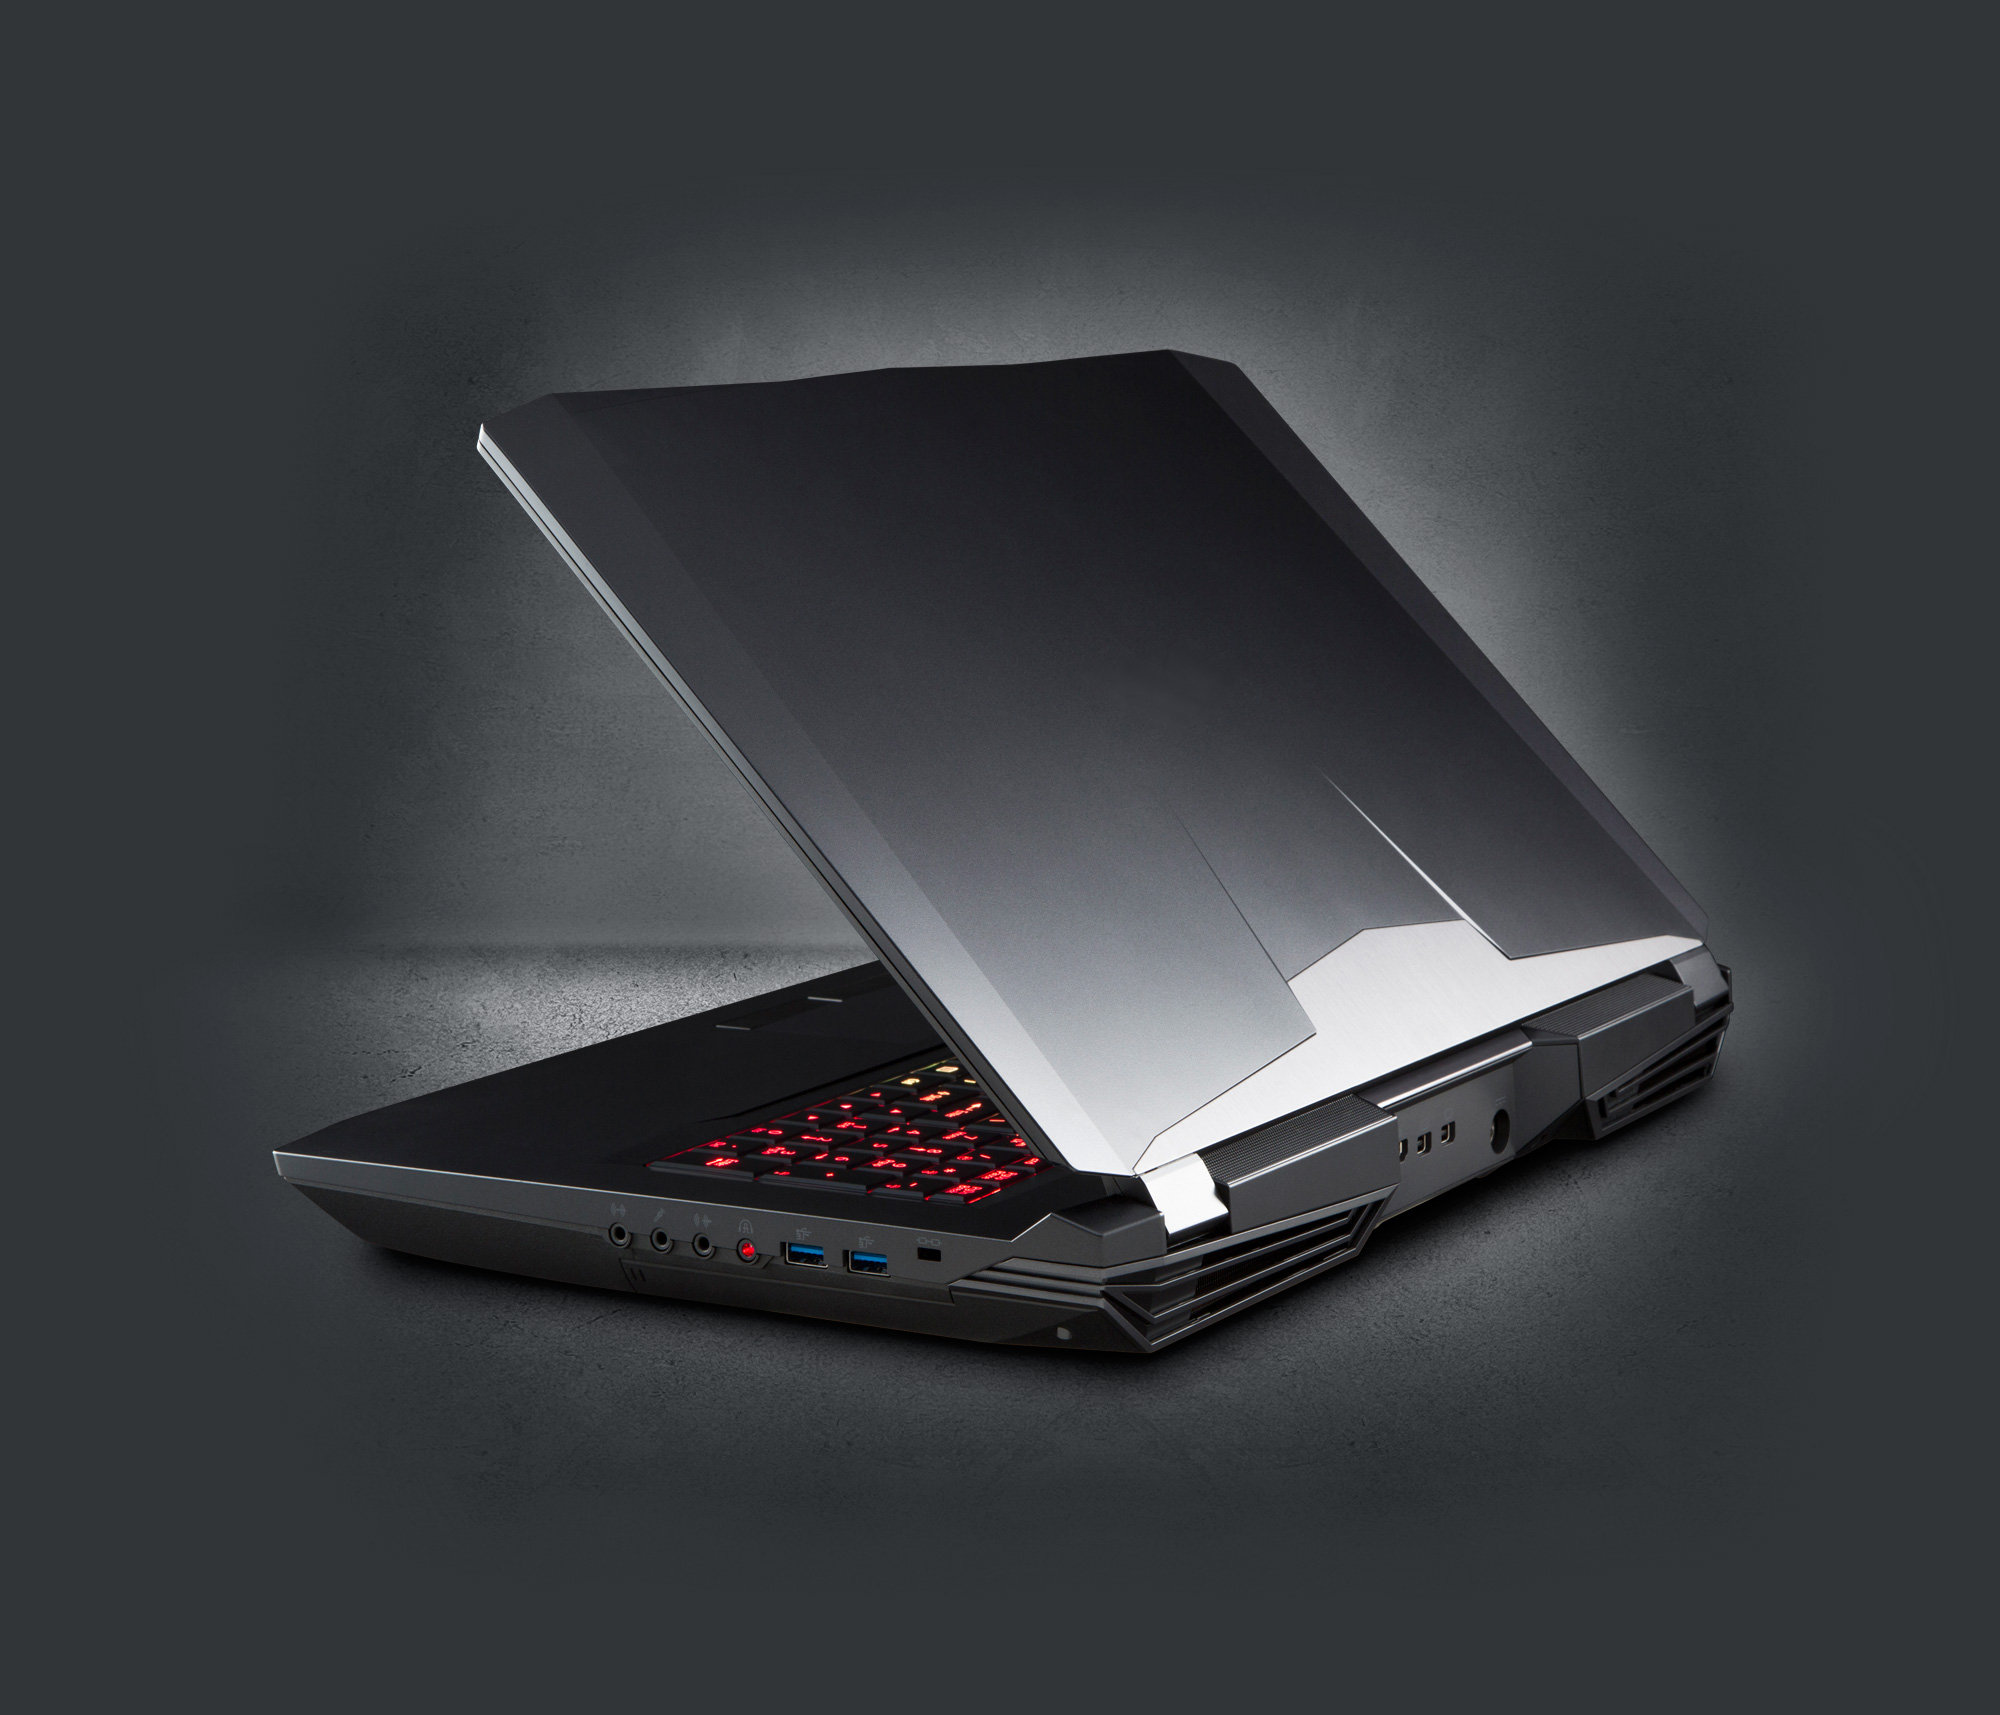 CLEVO P775TM1-G Desktop CPU Laptop   NVIDIA RTX 2080 VR MXM